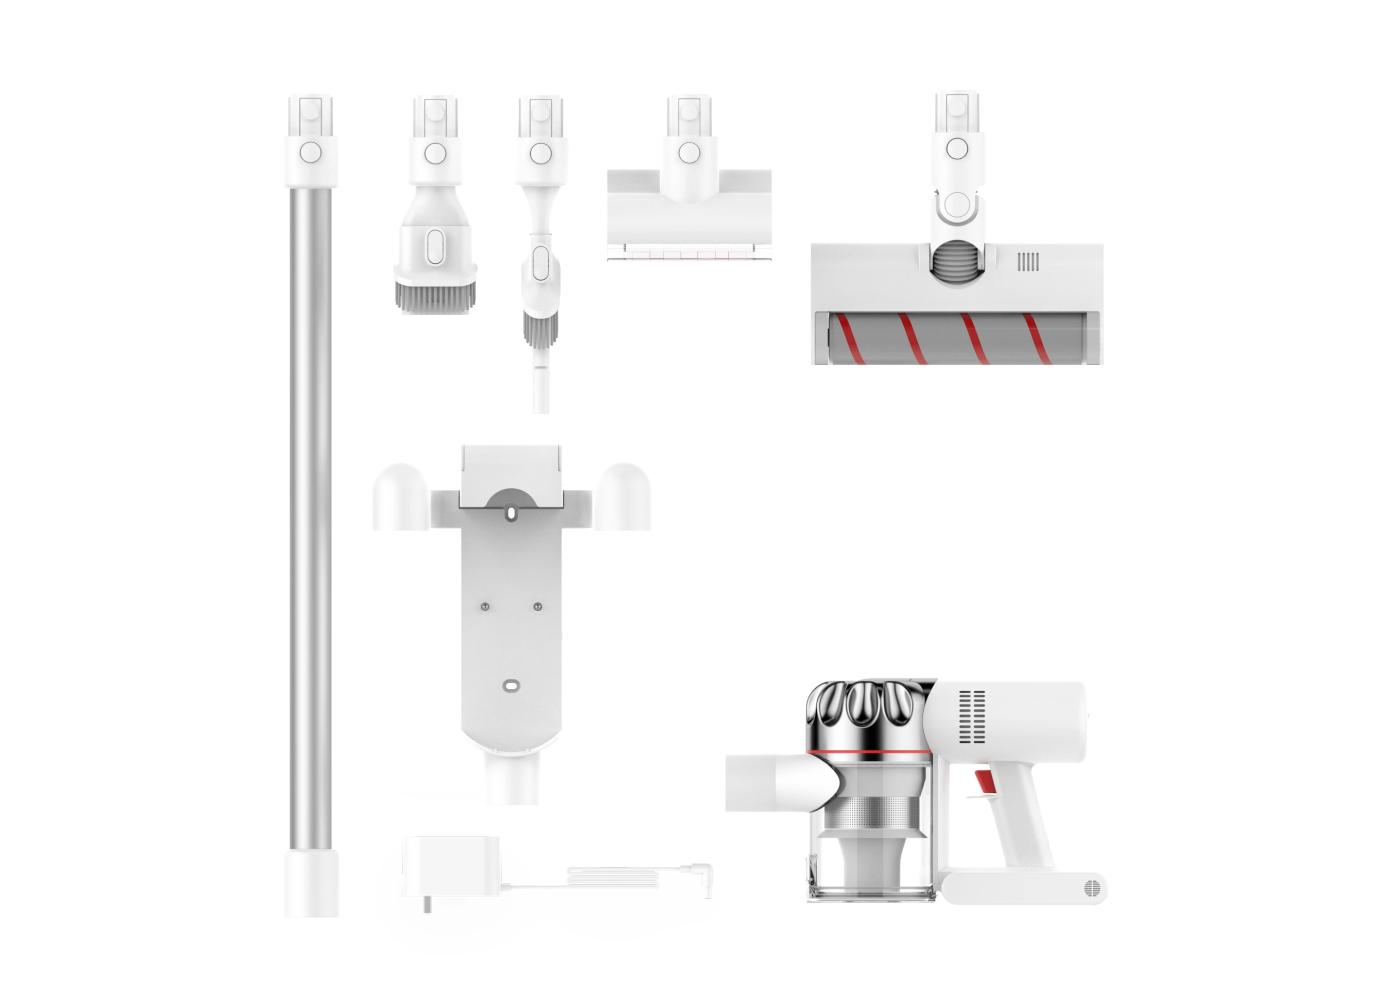 Opisanie Besprovodnoj Ruchnoj Pylesos Xiaomi Dreame V9p Wireless Vacuum Cleaner 5